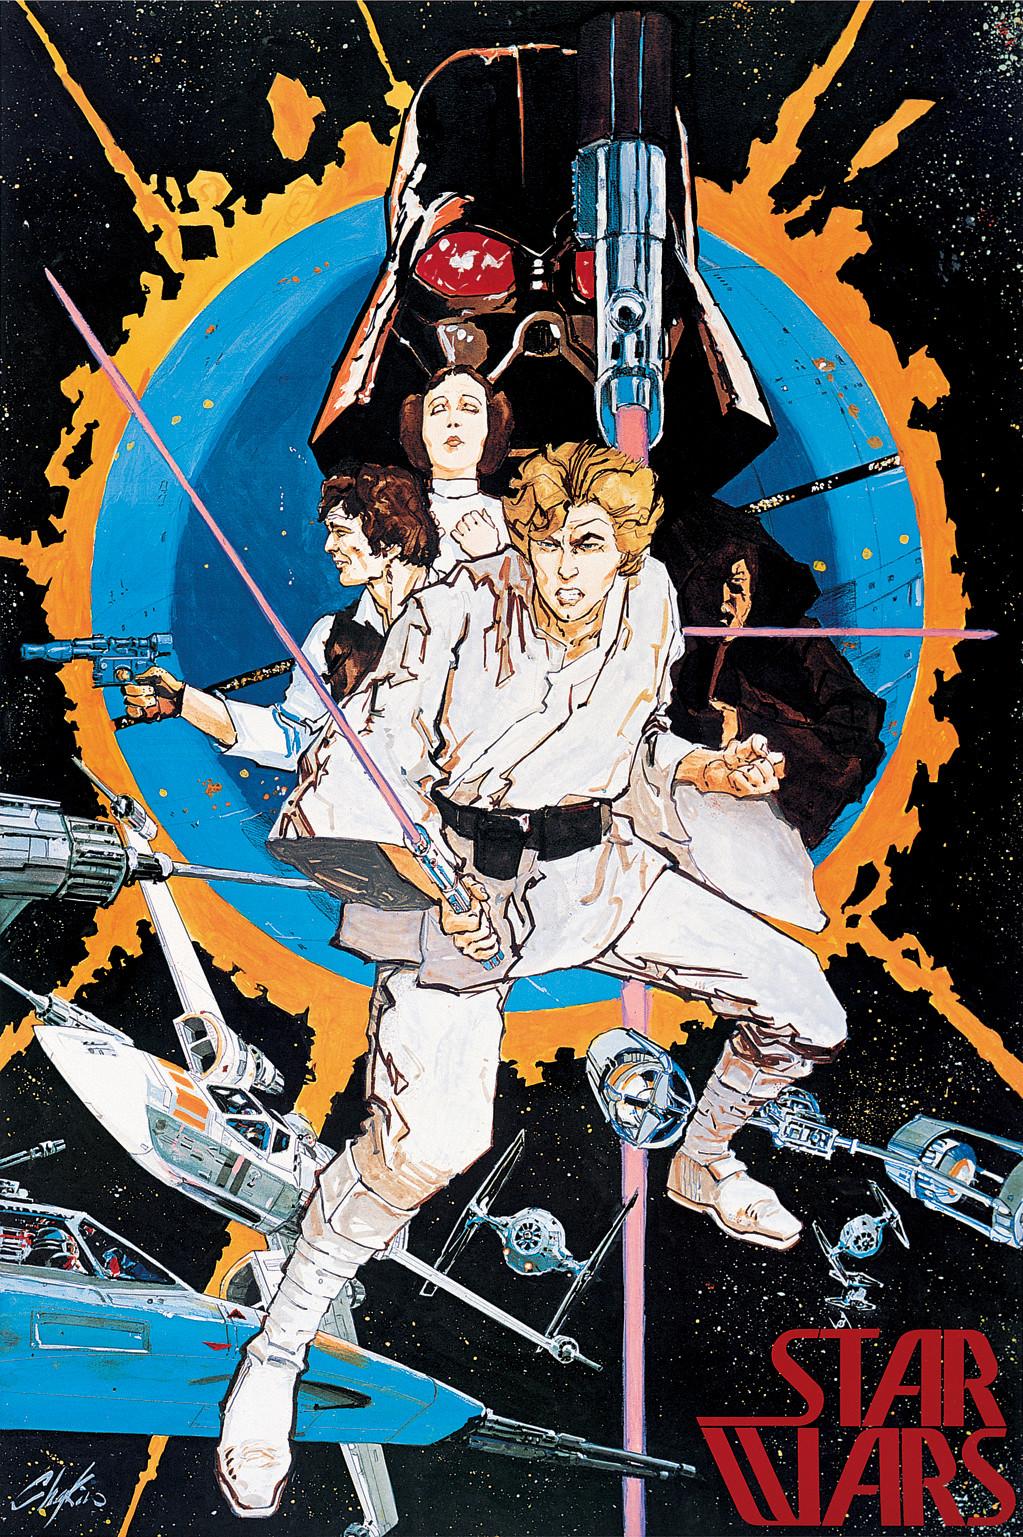 Howard Chaykin star wars poster